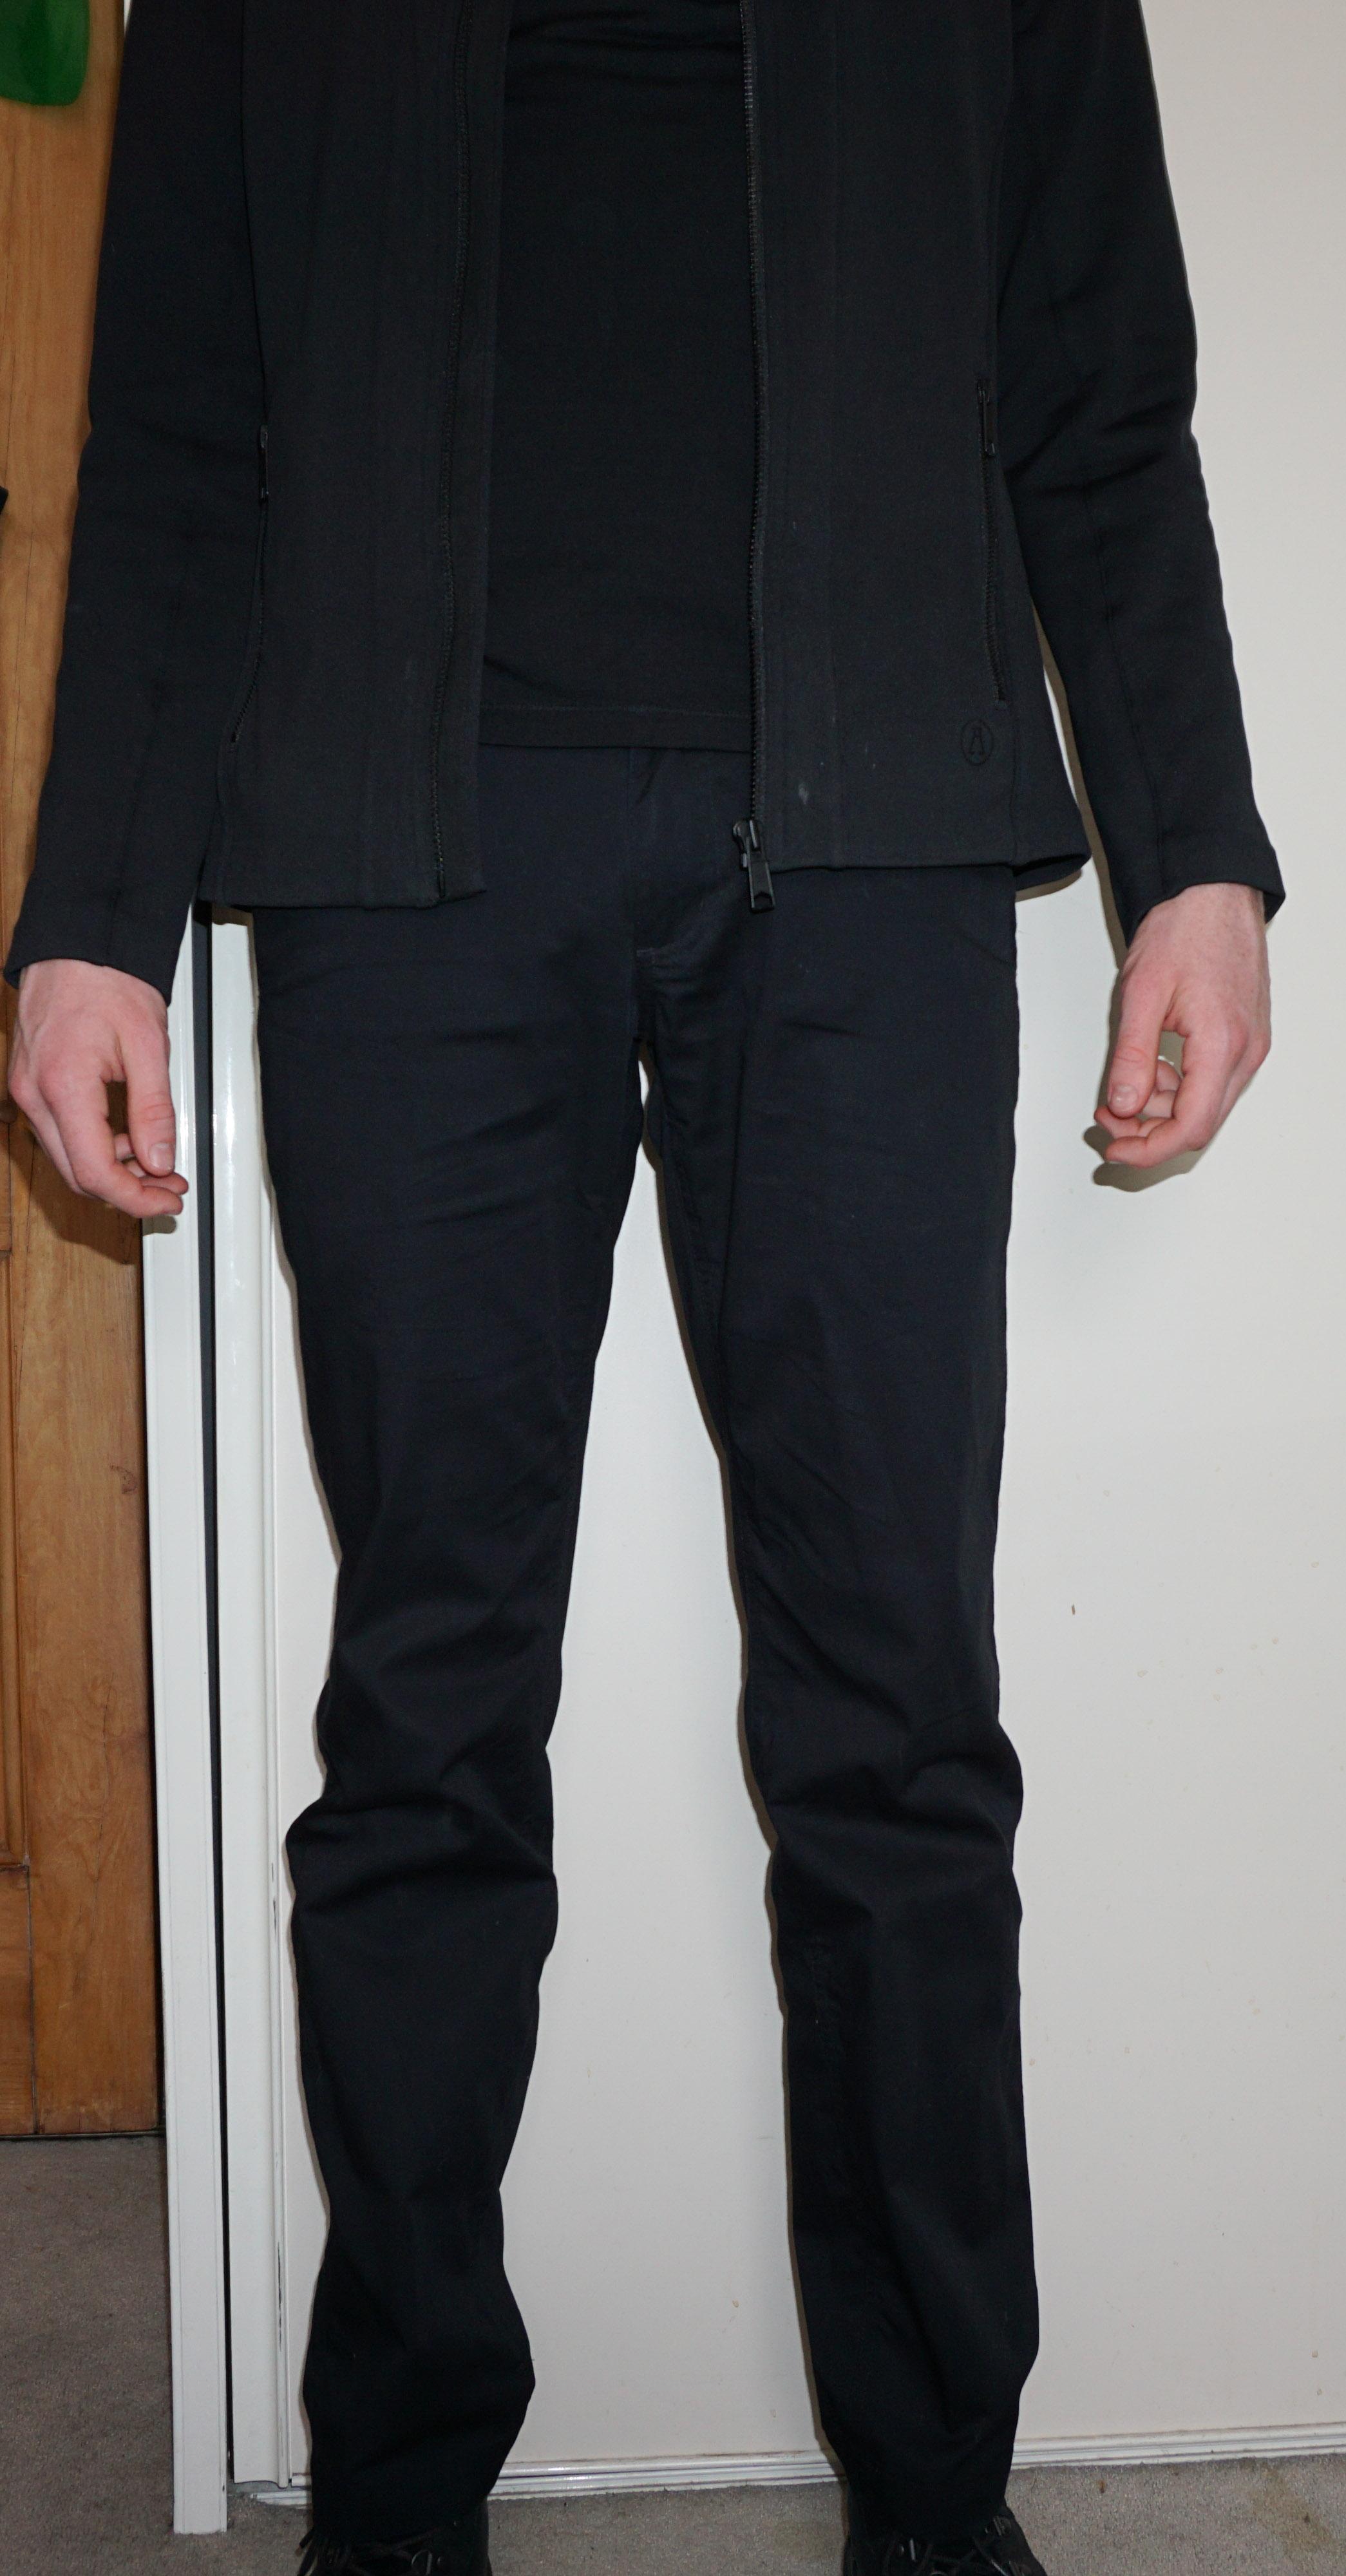 3xdry pants fit